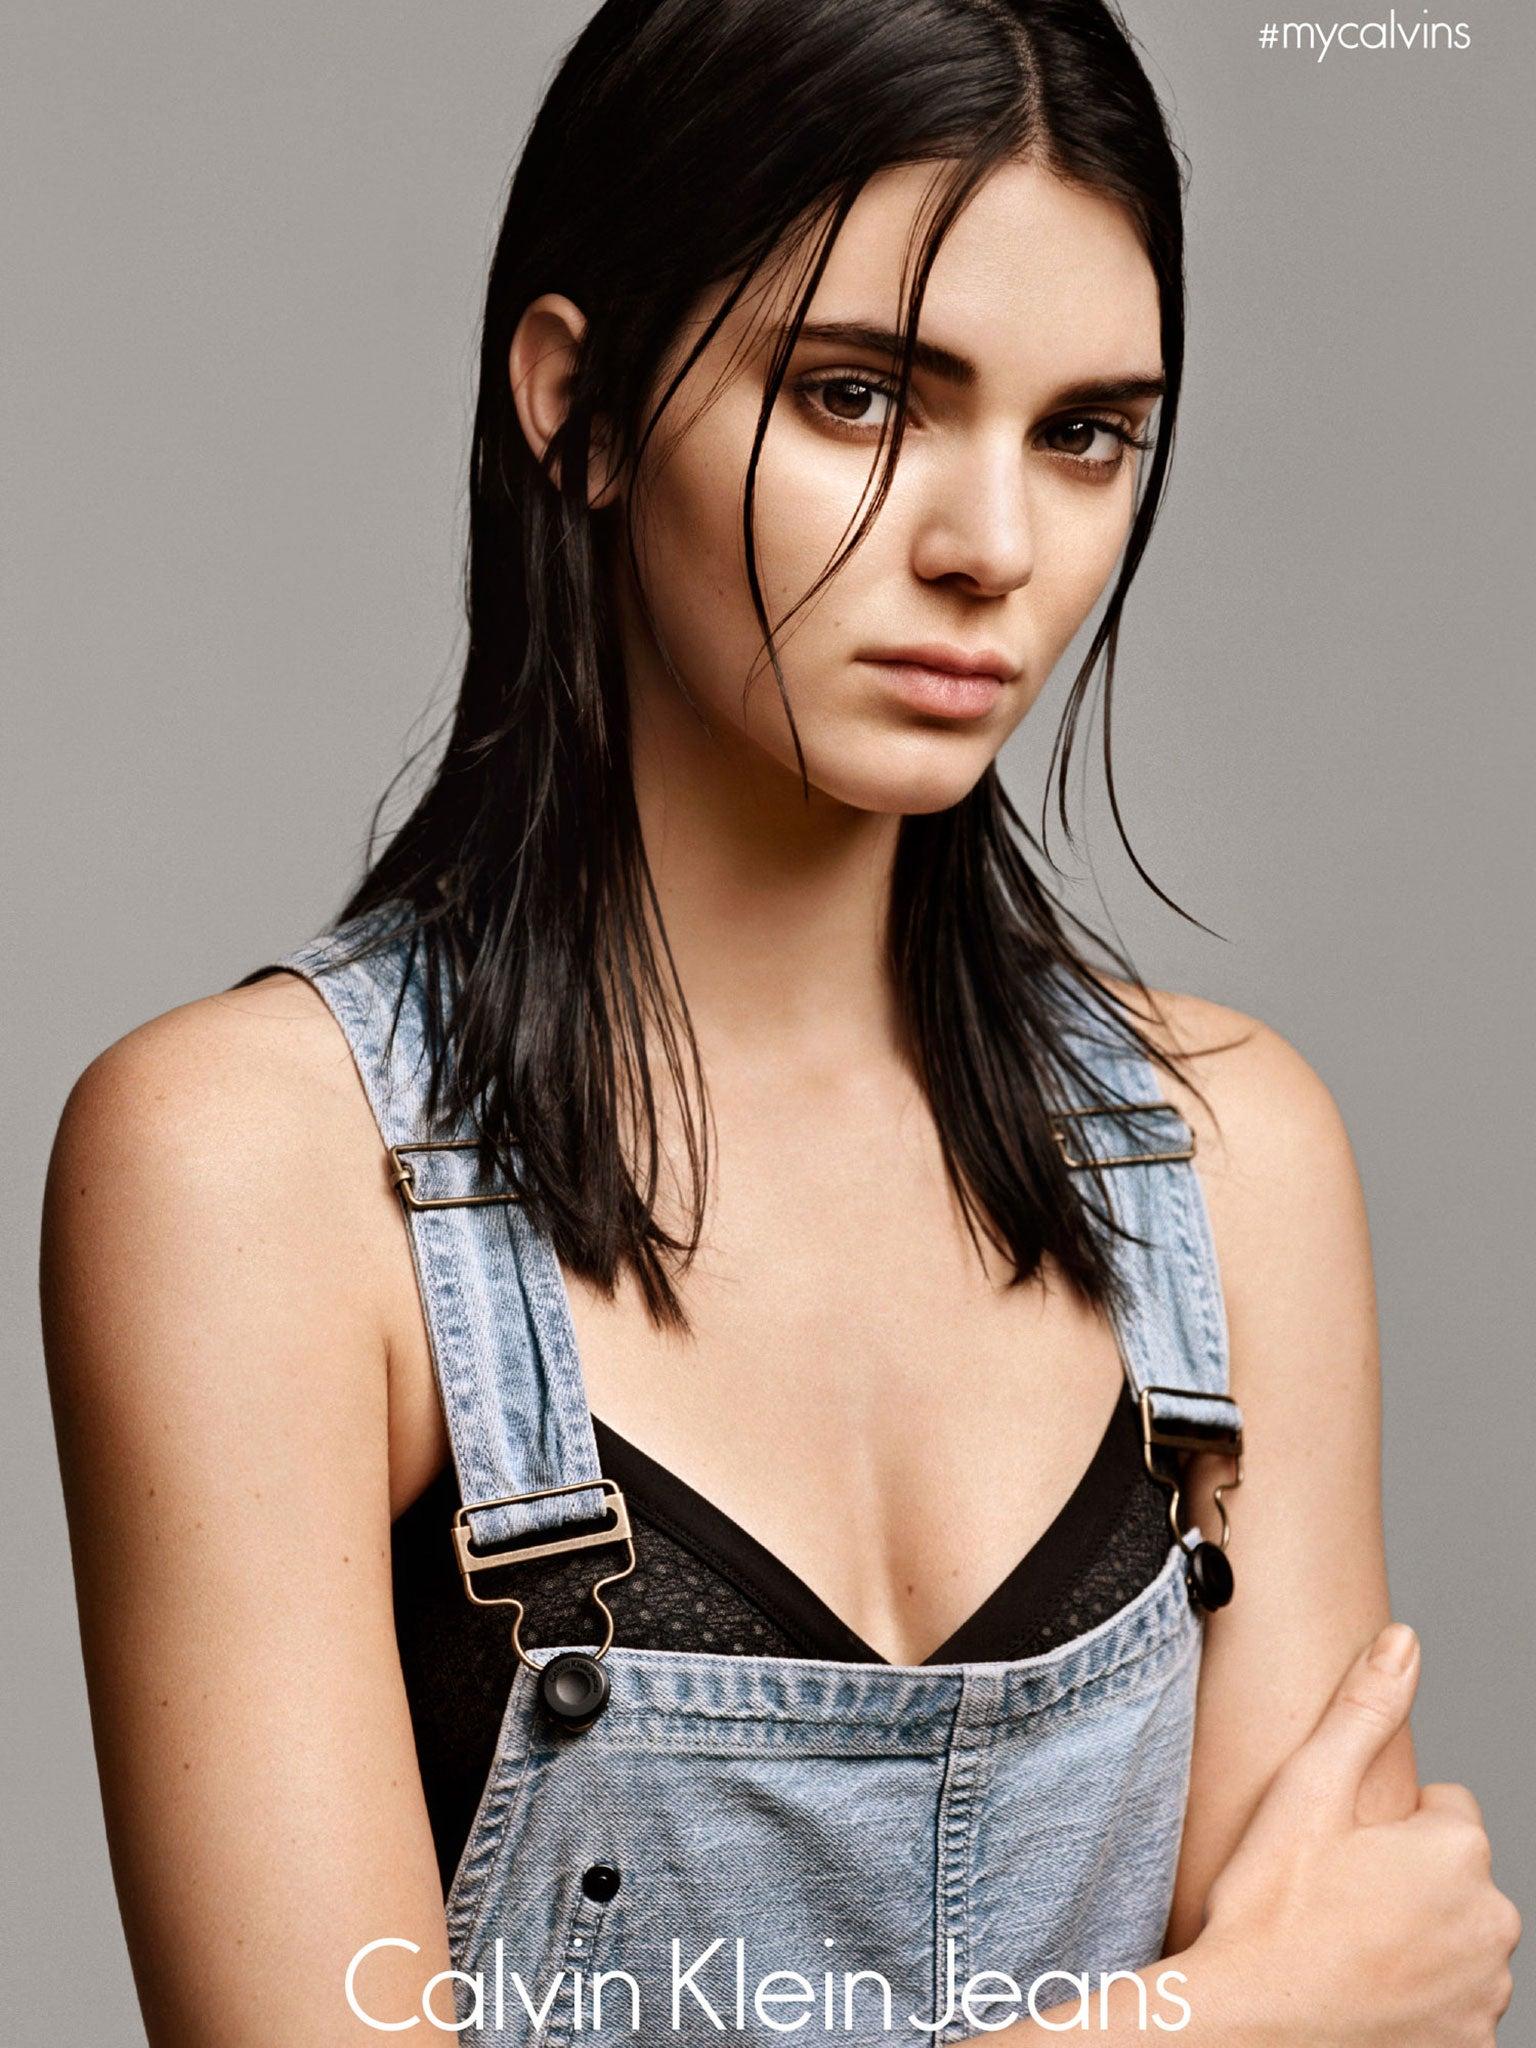 Kendall Jenner Lands Calvin Klein Jeans Campaign